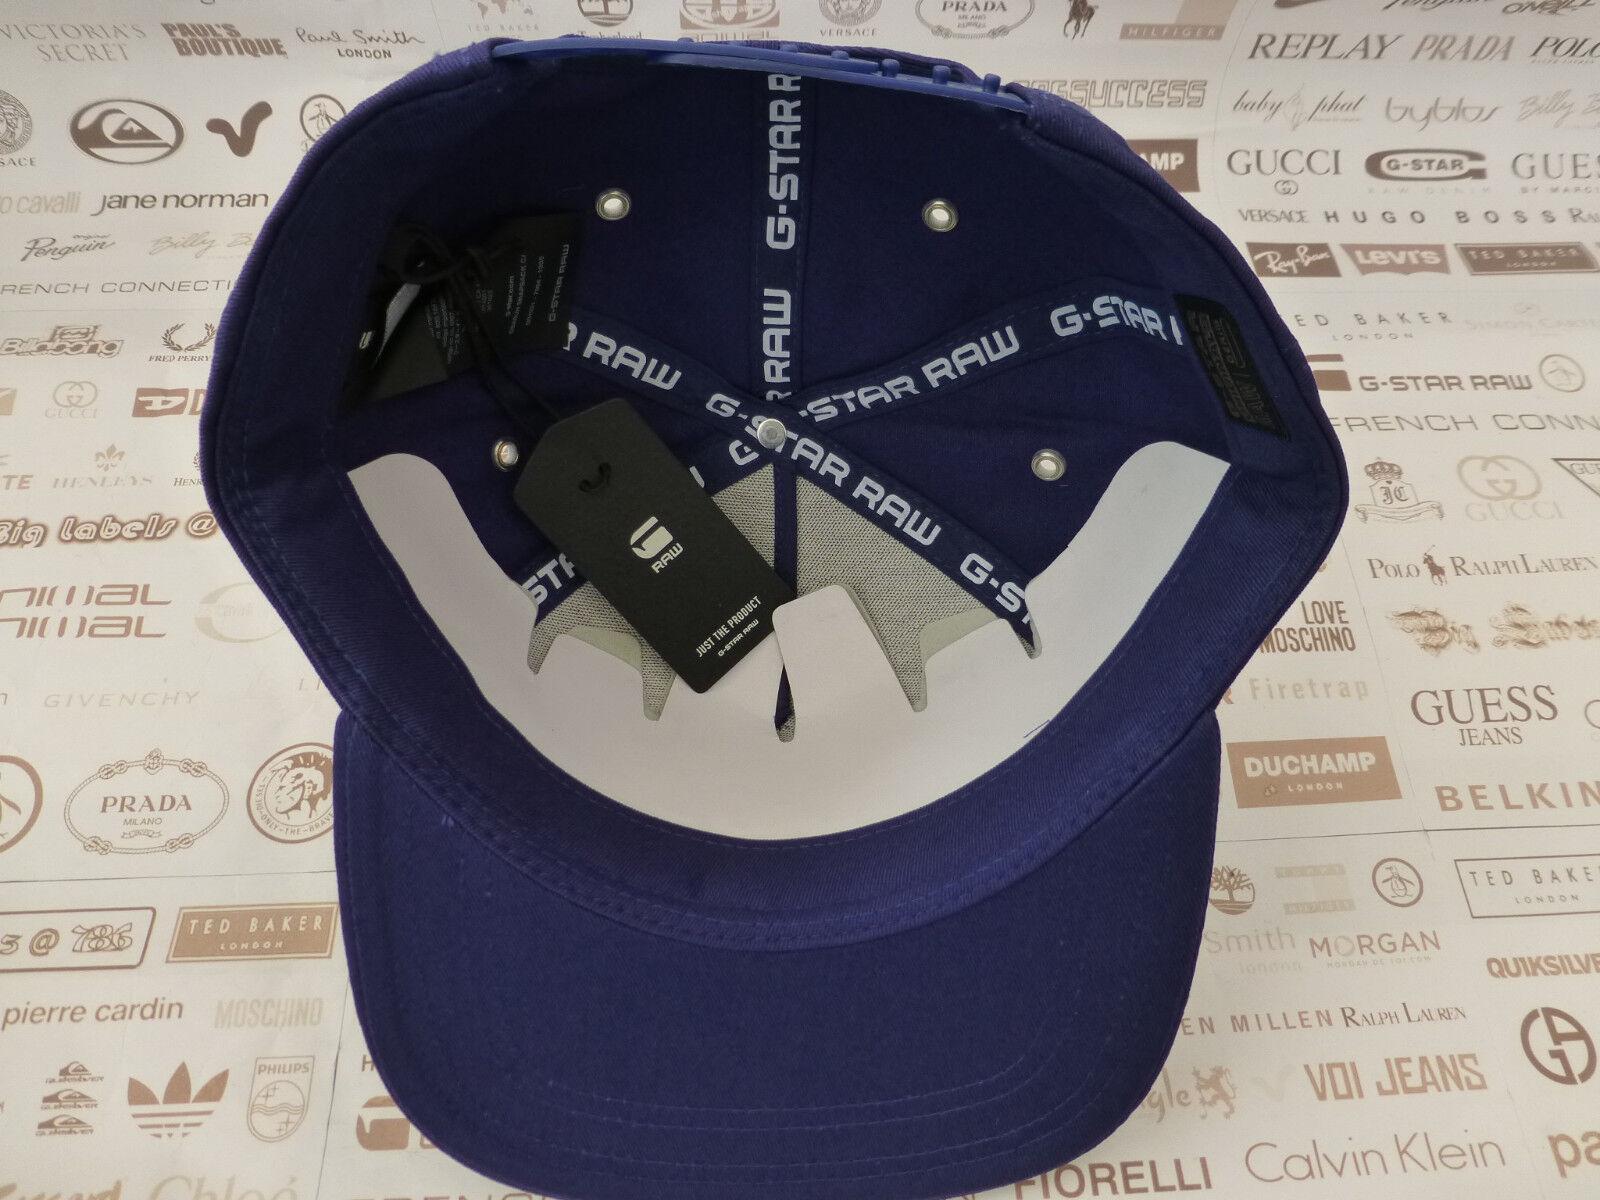 872c4cc35238f G-Star Raw Flat Brim Cap Mens Obaruh Snapback S Blue Hat Baseball Style Caps  for sale online | eBay